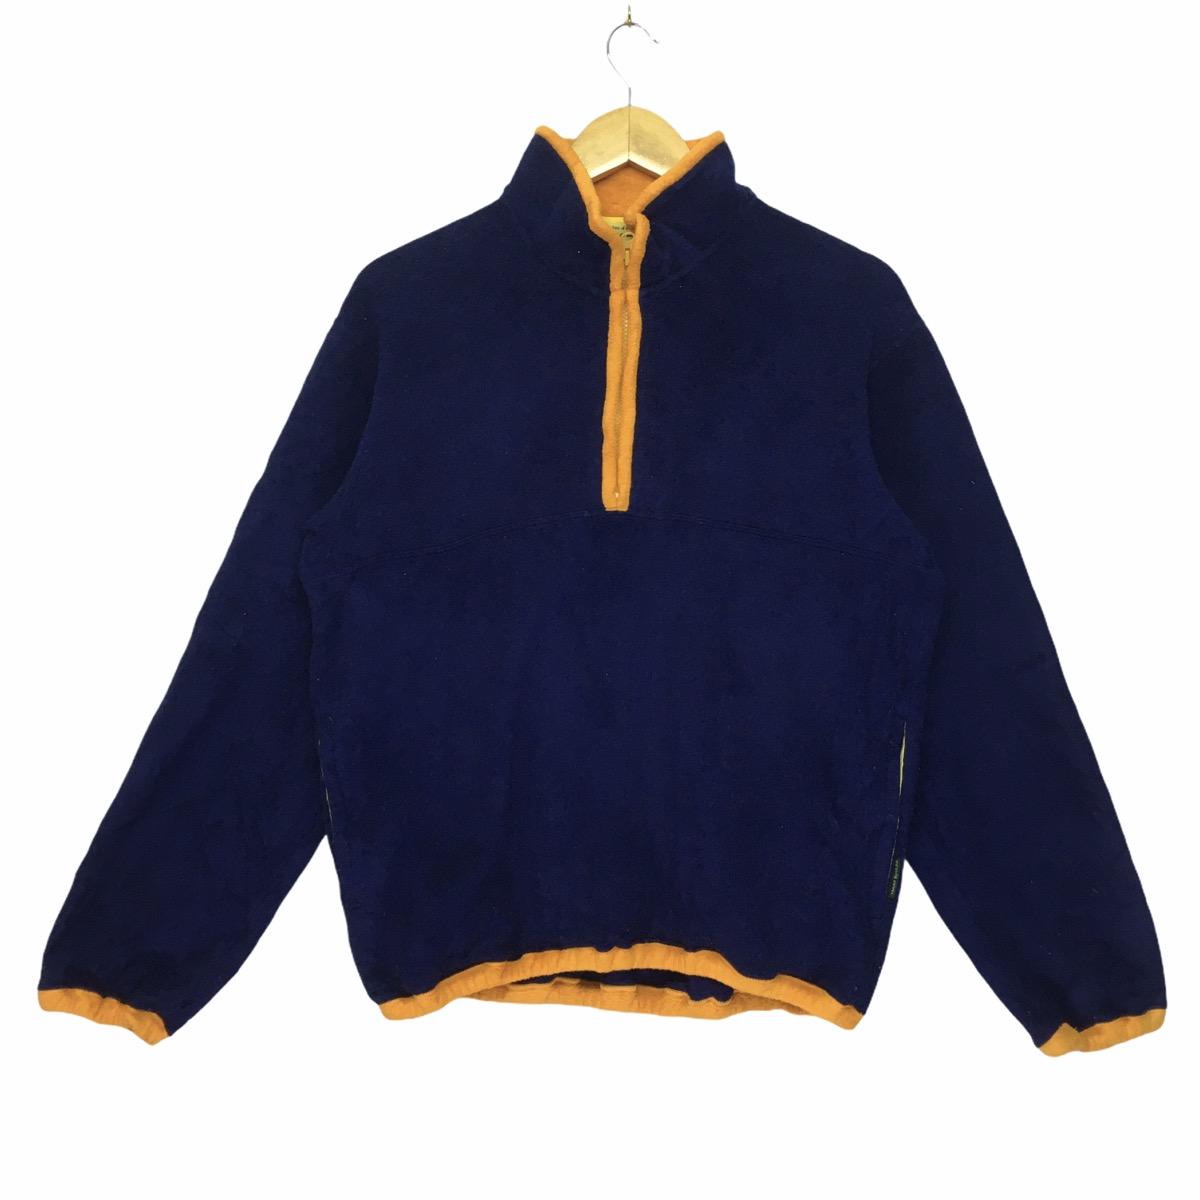 Marque Essentials Quarter-Zip Polar Fleece Jacket Fille